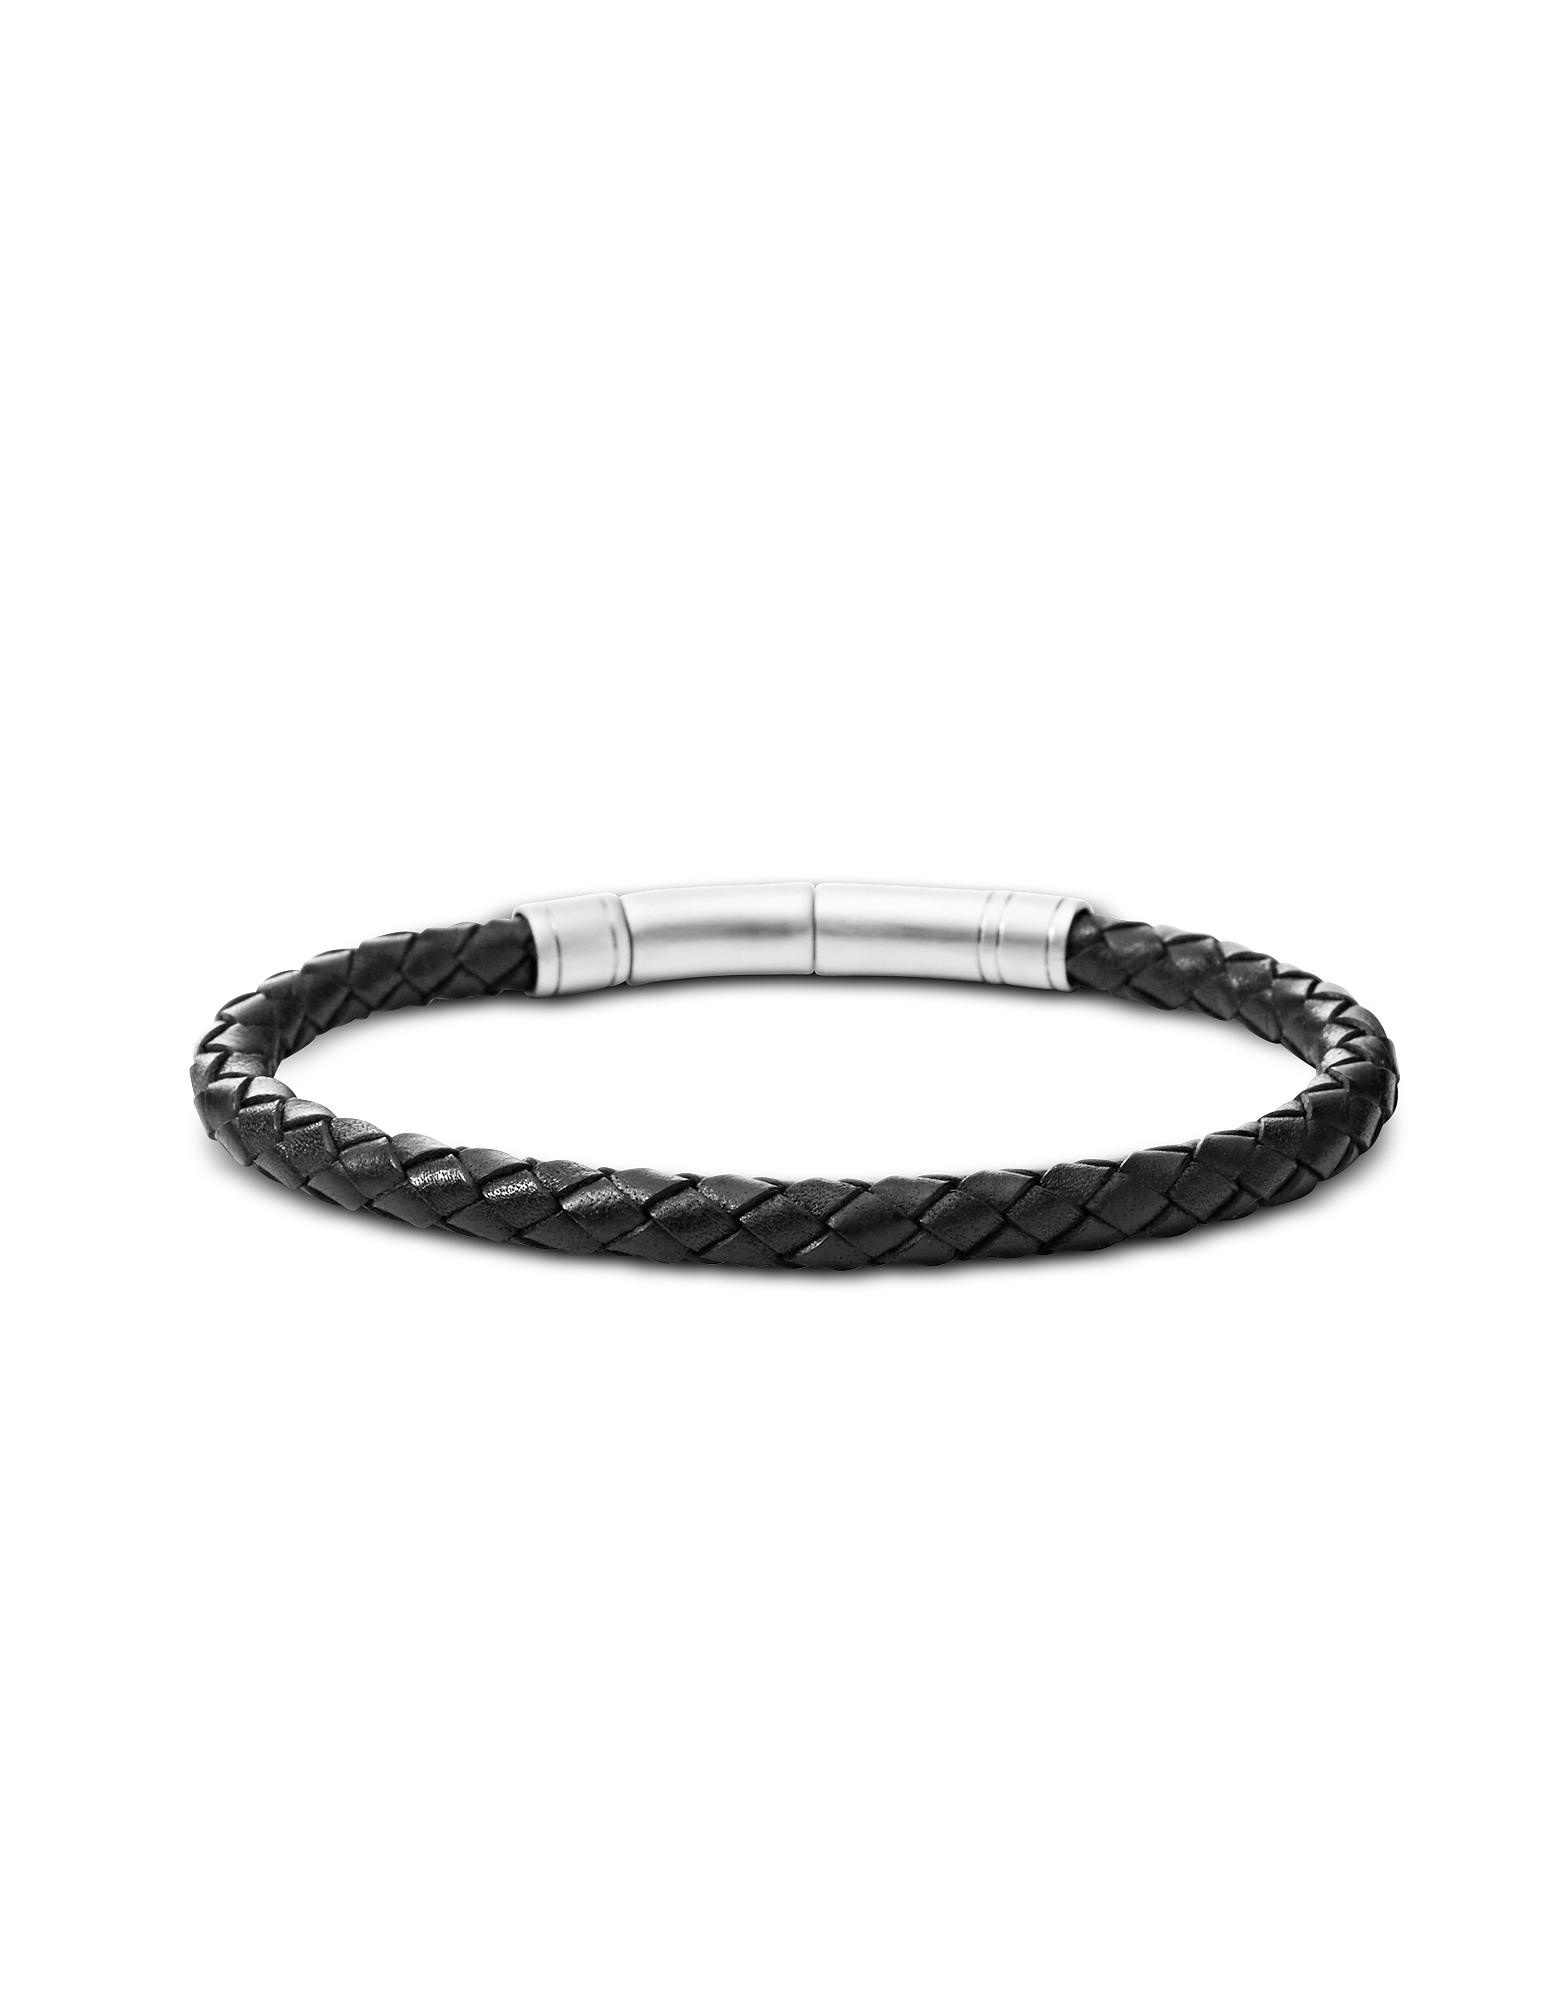 Black Skinny Braid Men's Bracelet